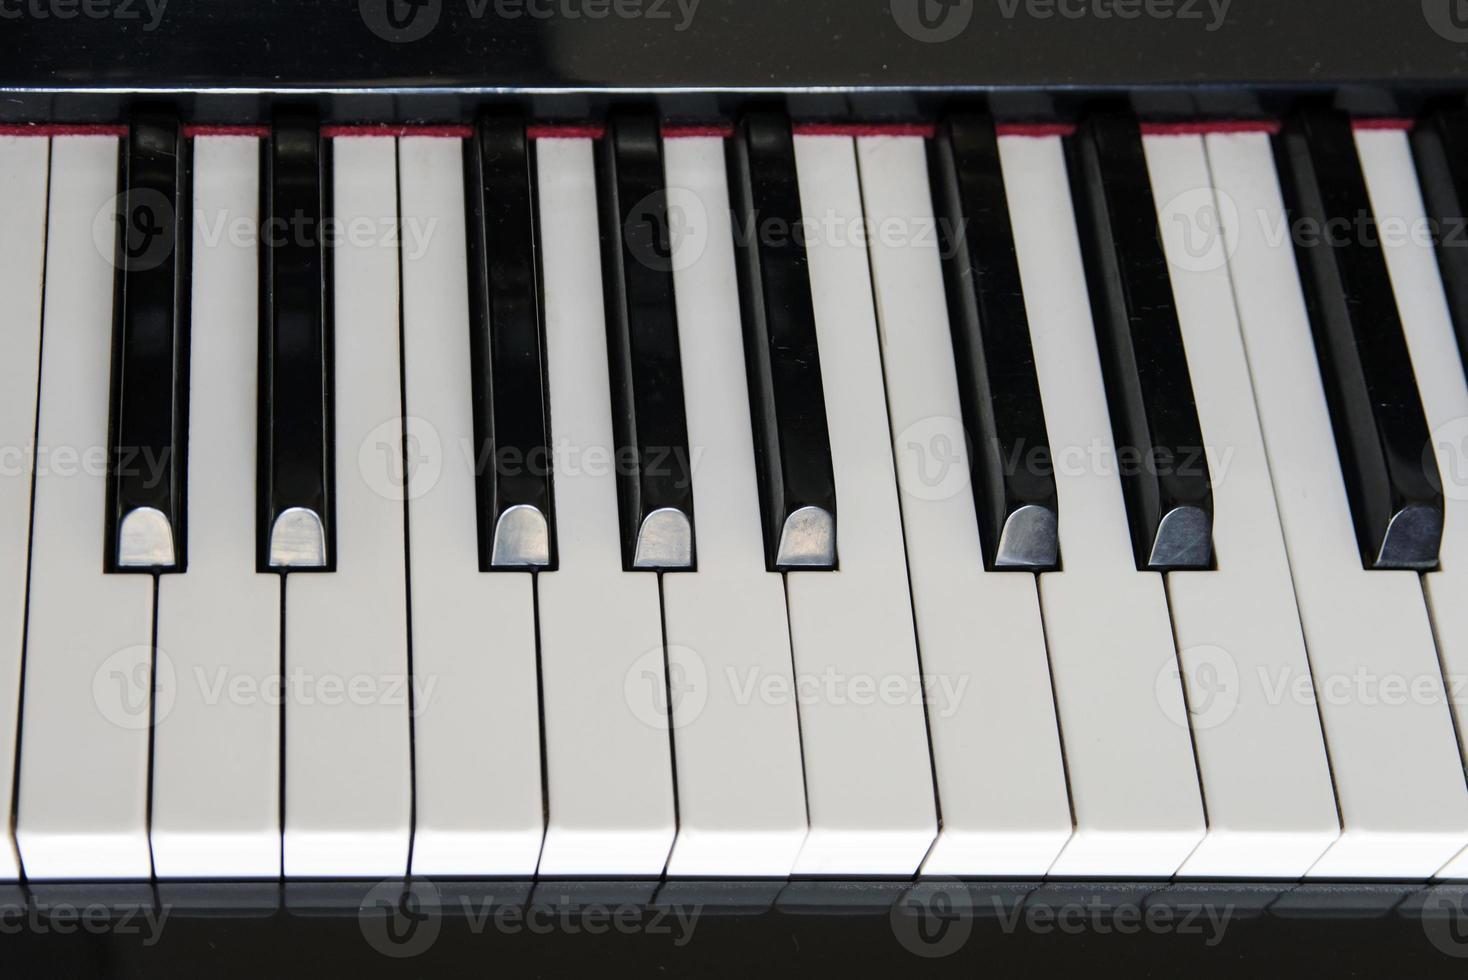 gros plan des touches du piano. photo